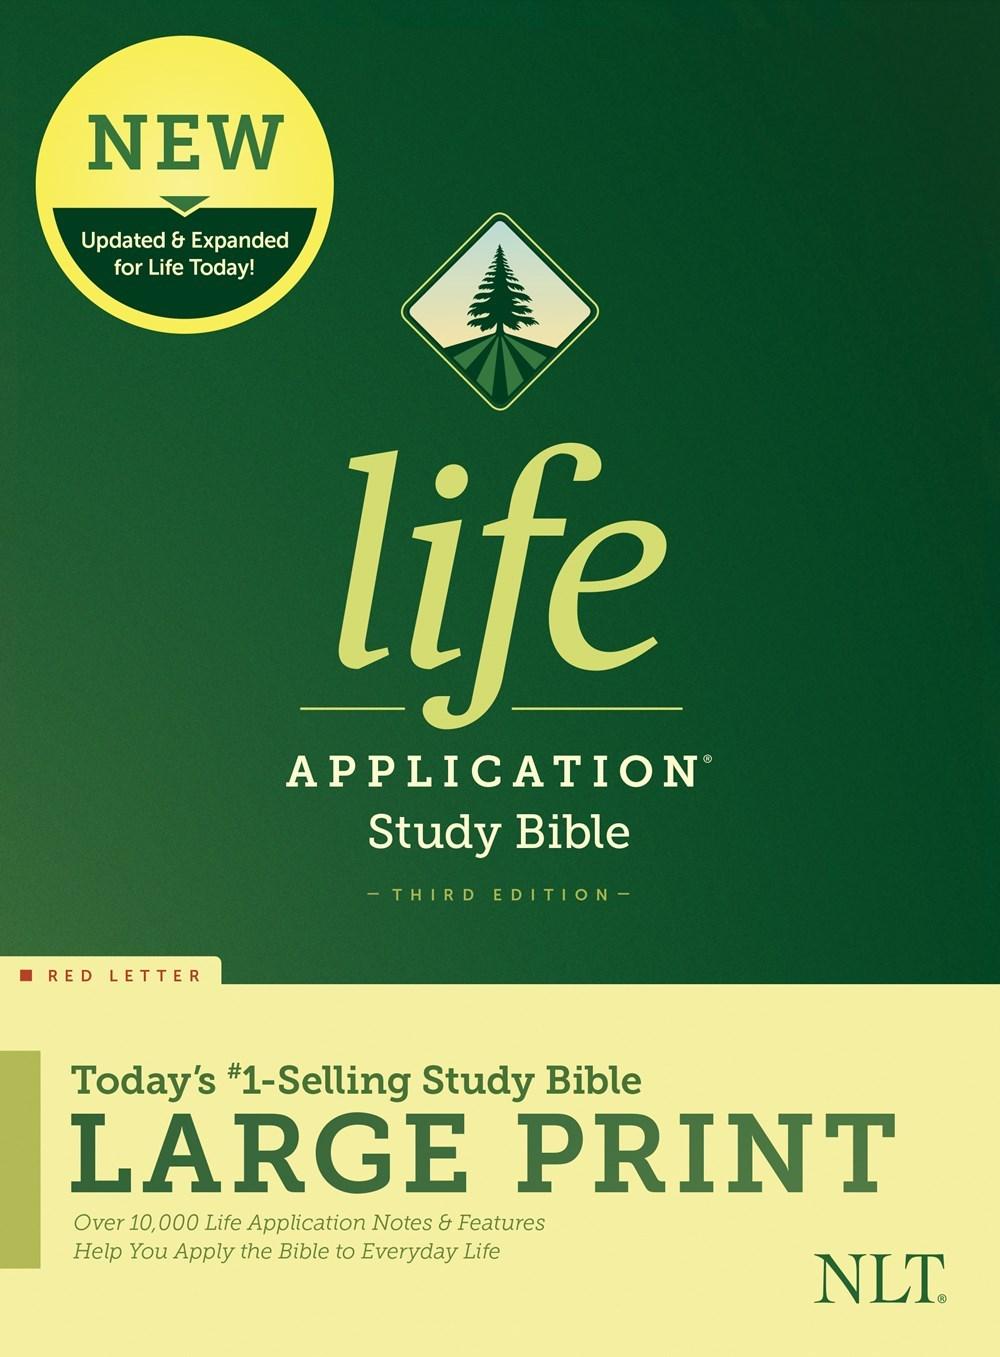 NLT Life Application Study Bible/Large Print (Third Edition) (RL)-Hardcover